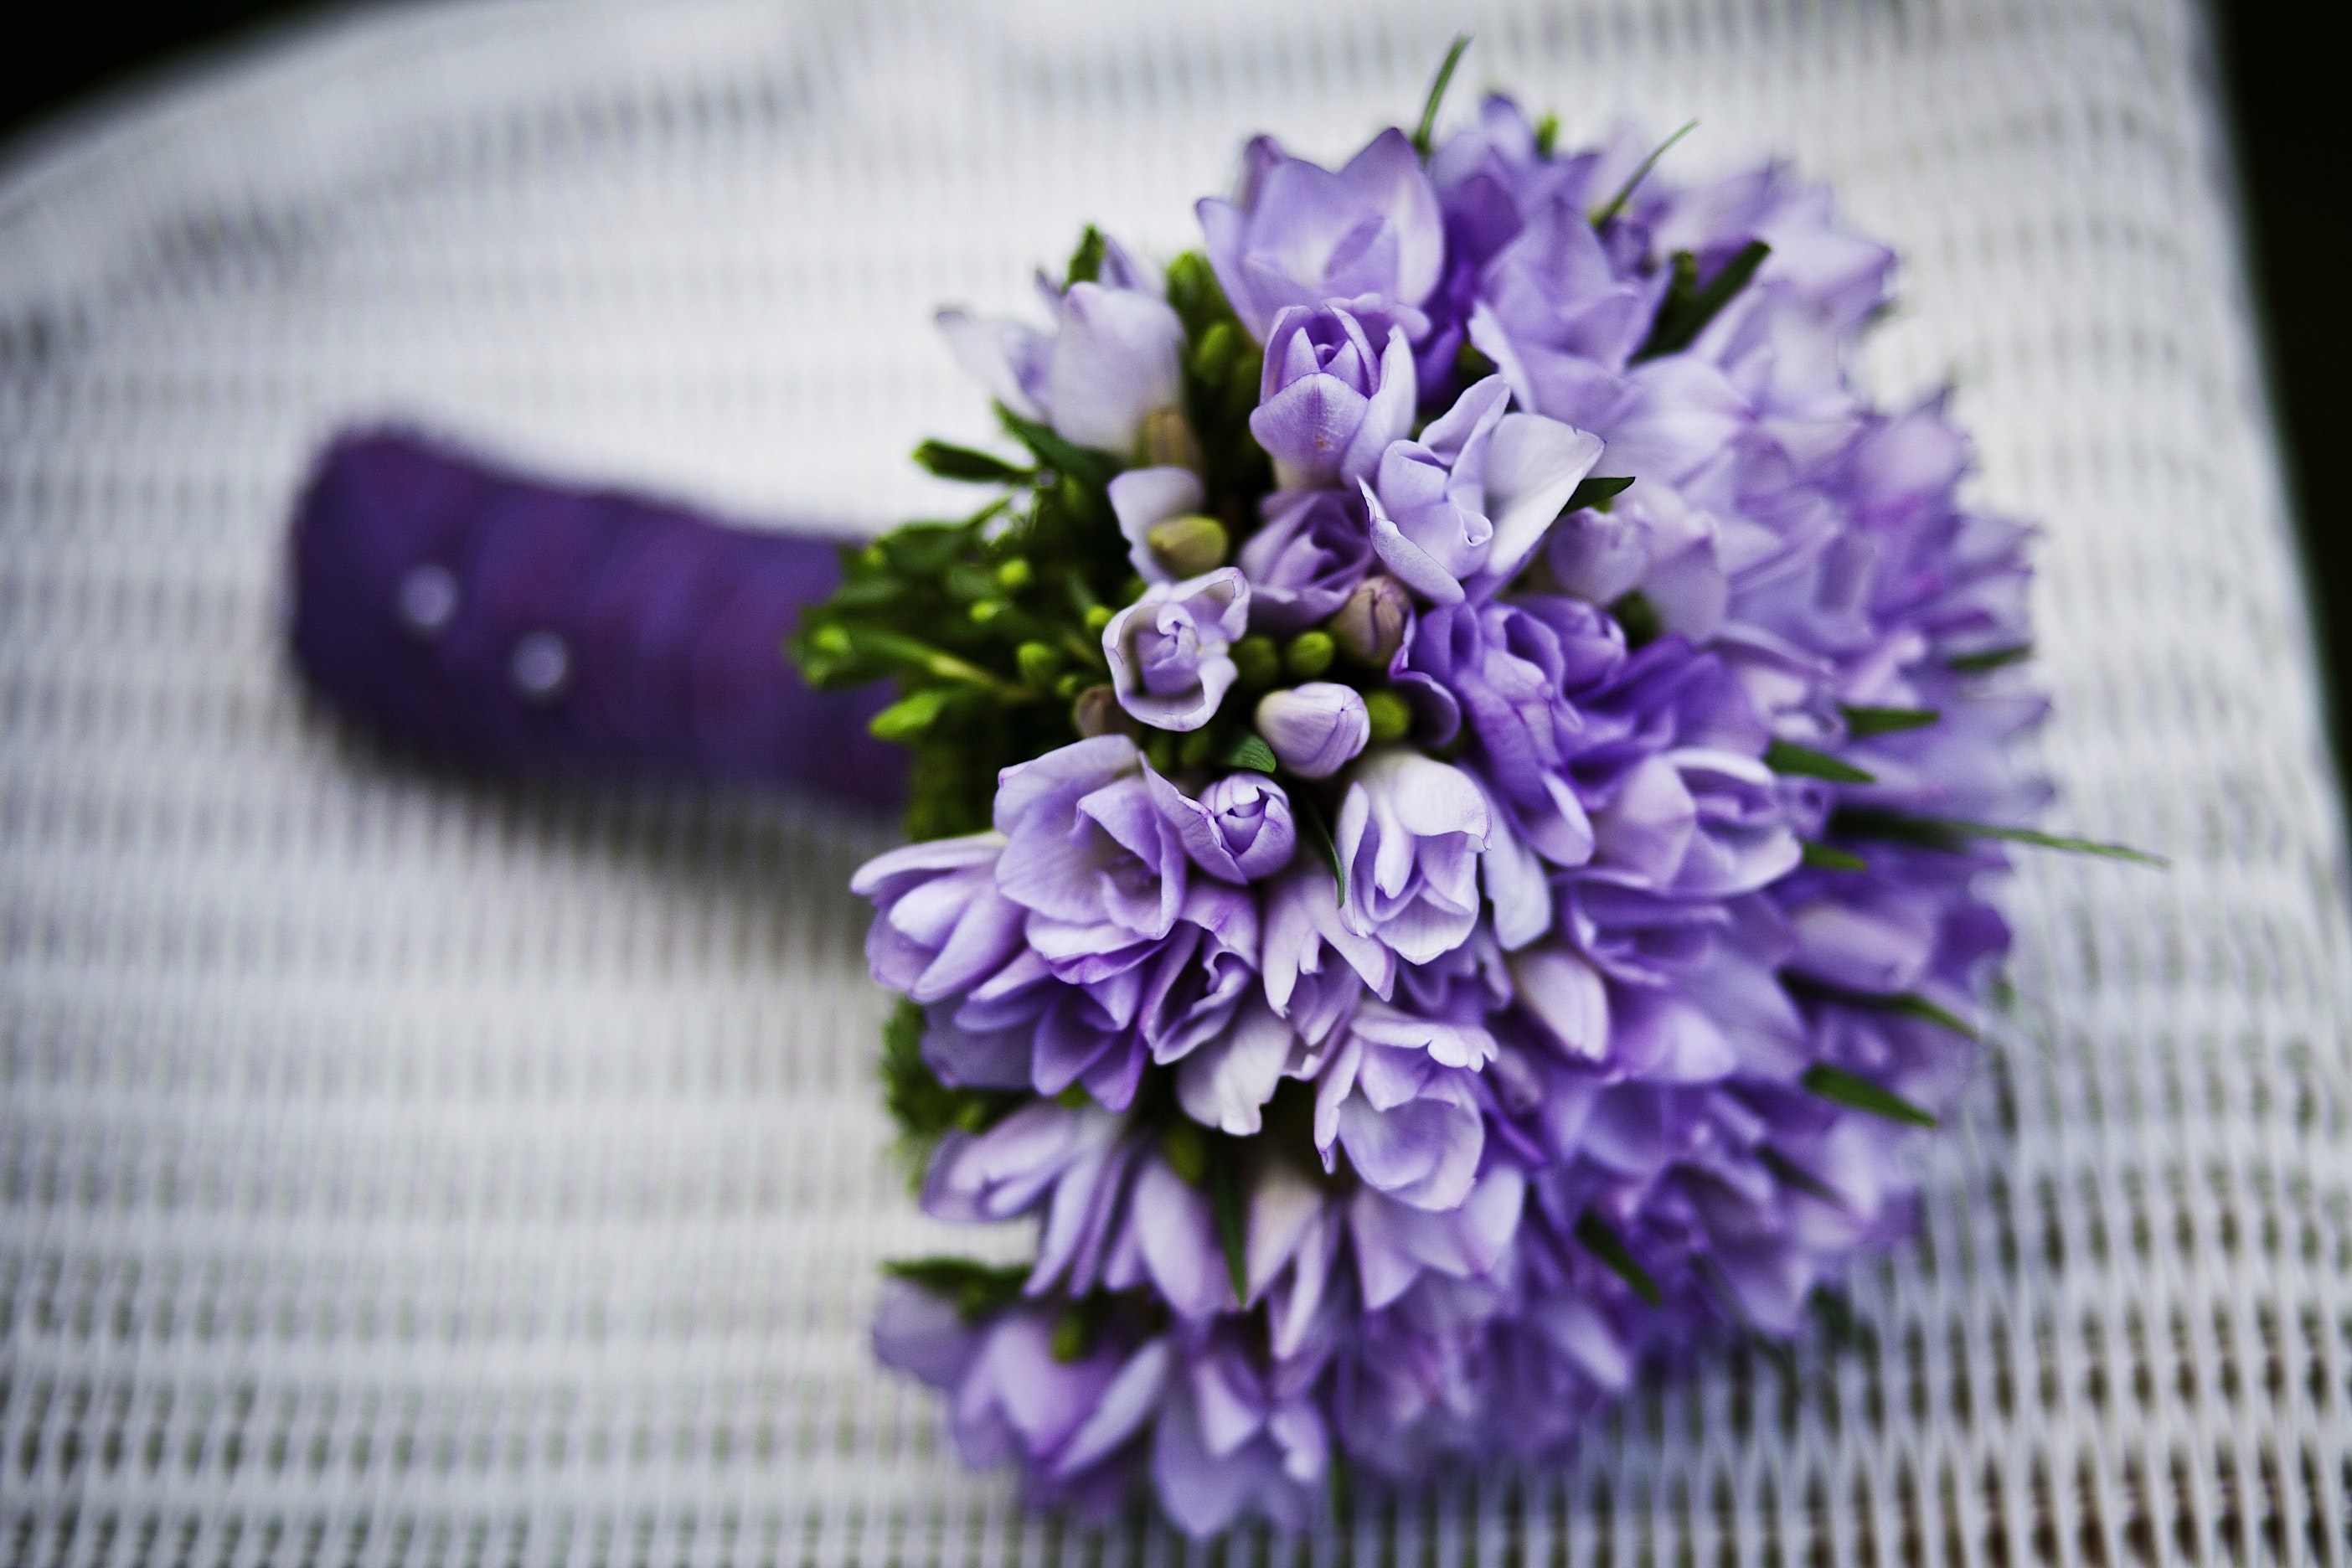 Free photo purple flower bouquet on white woven chair flowers purple flower bouquet on white woven chair flowers purple flora close mightylinksfo